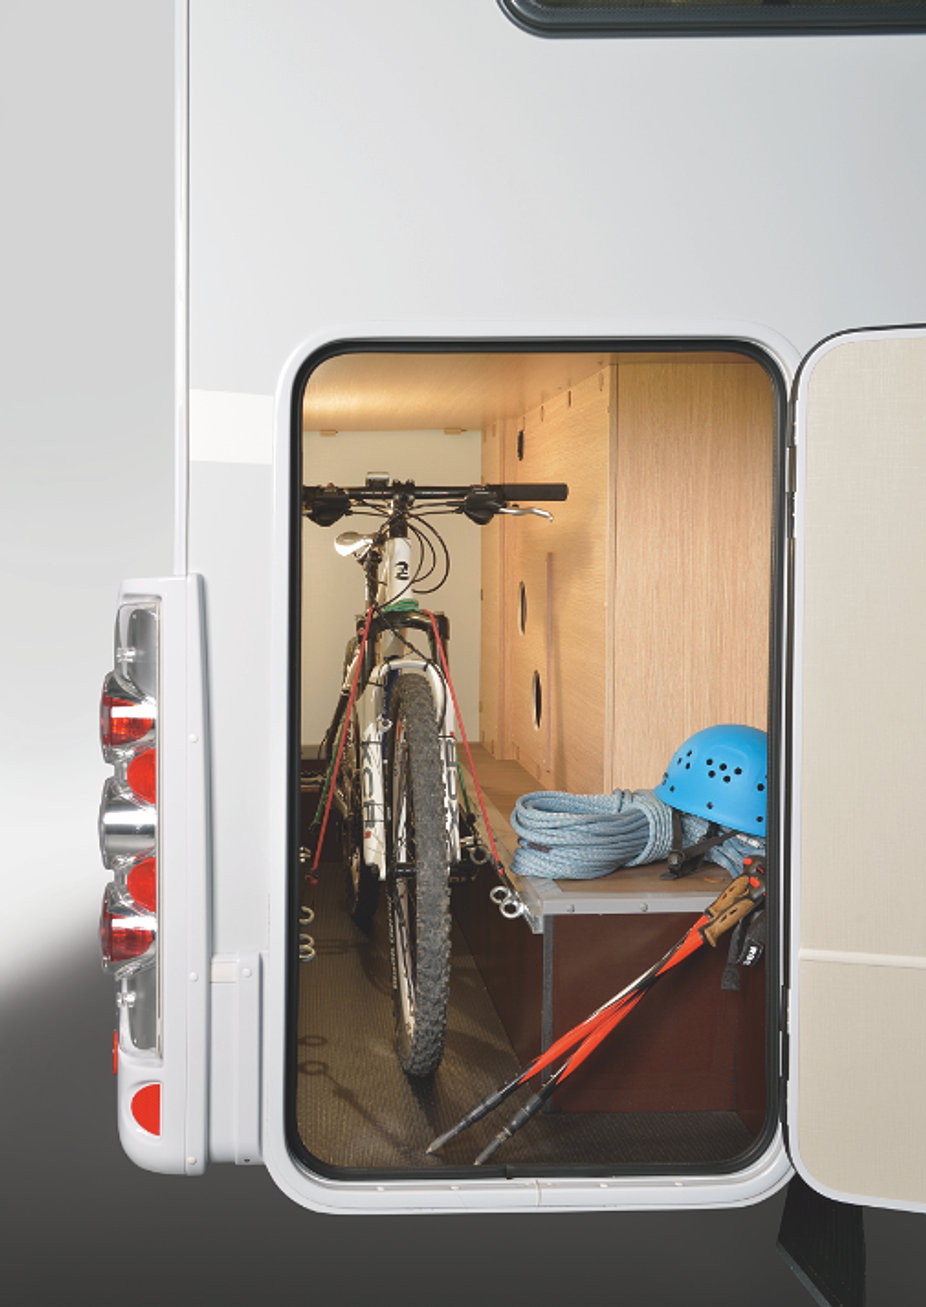 nos camping cars camping islande location camping car islande. Black Bedroom Furniture Sets. Home Design Ideas